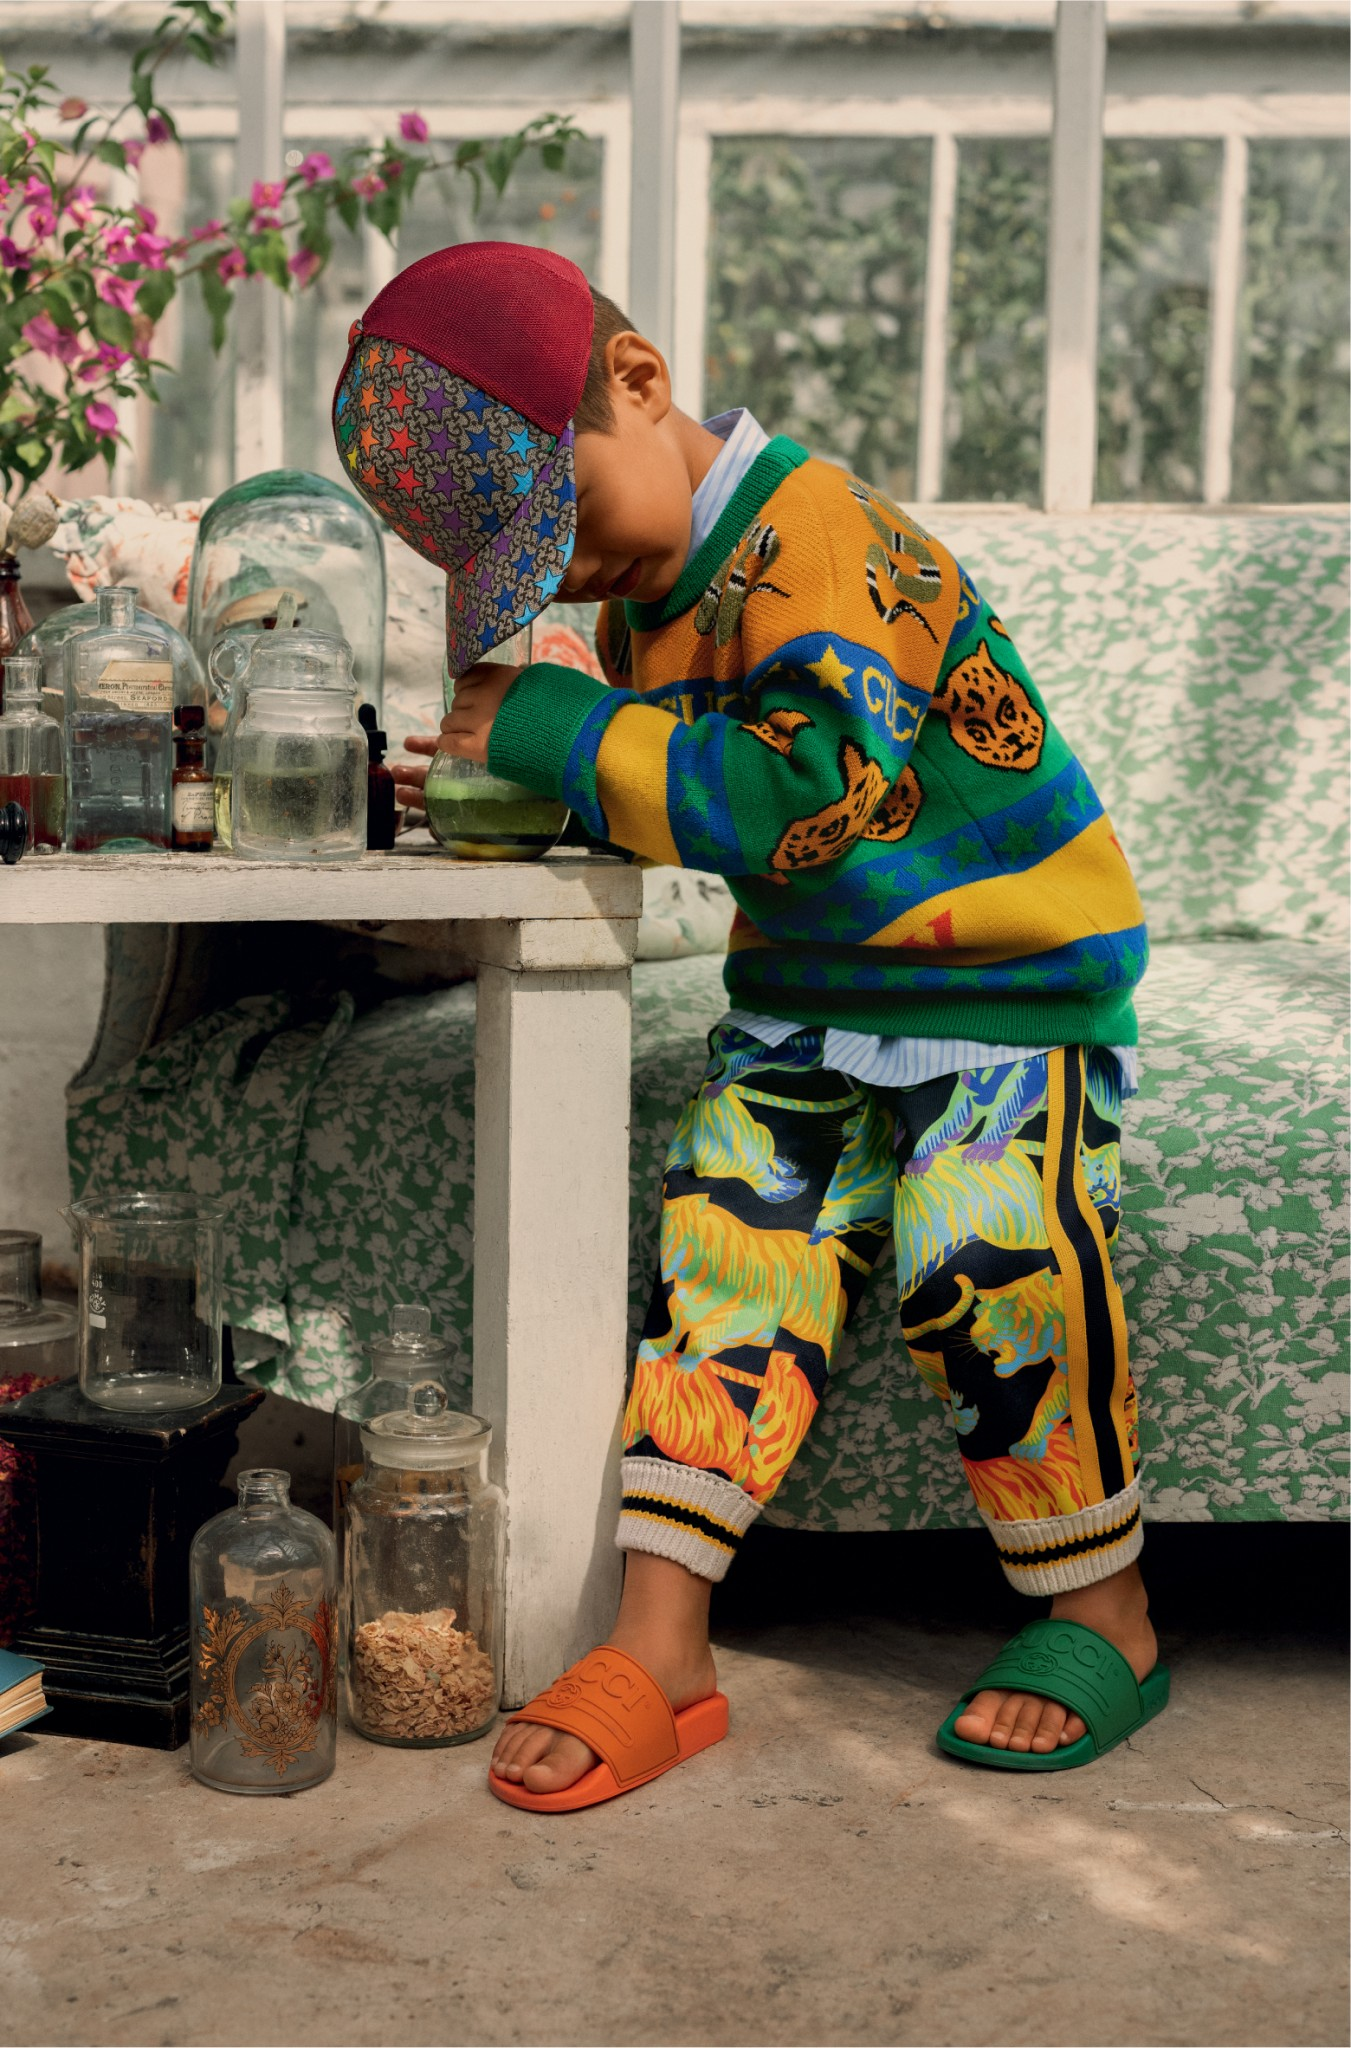 Kind in der Gucci ss19 Kampagne